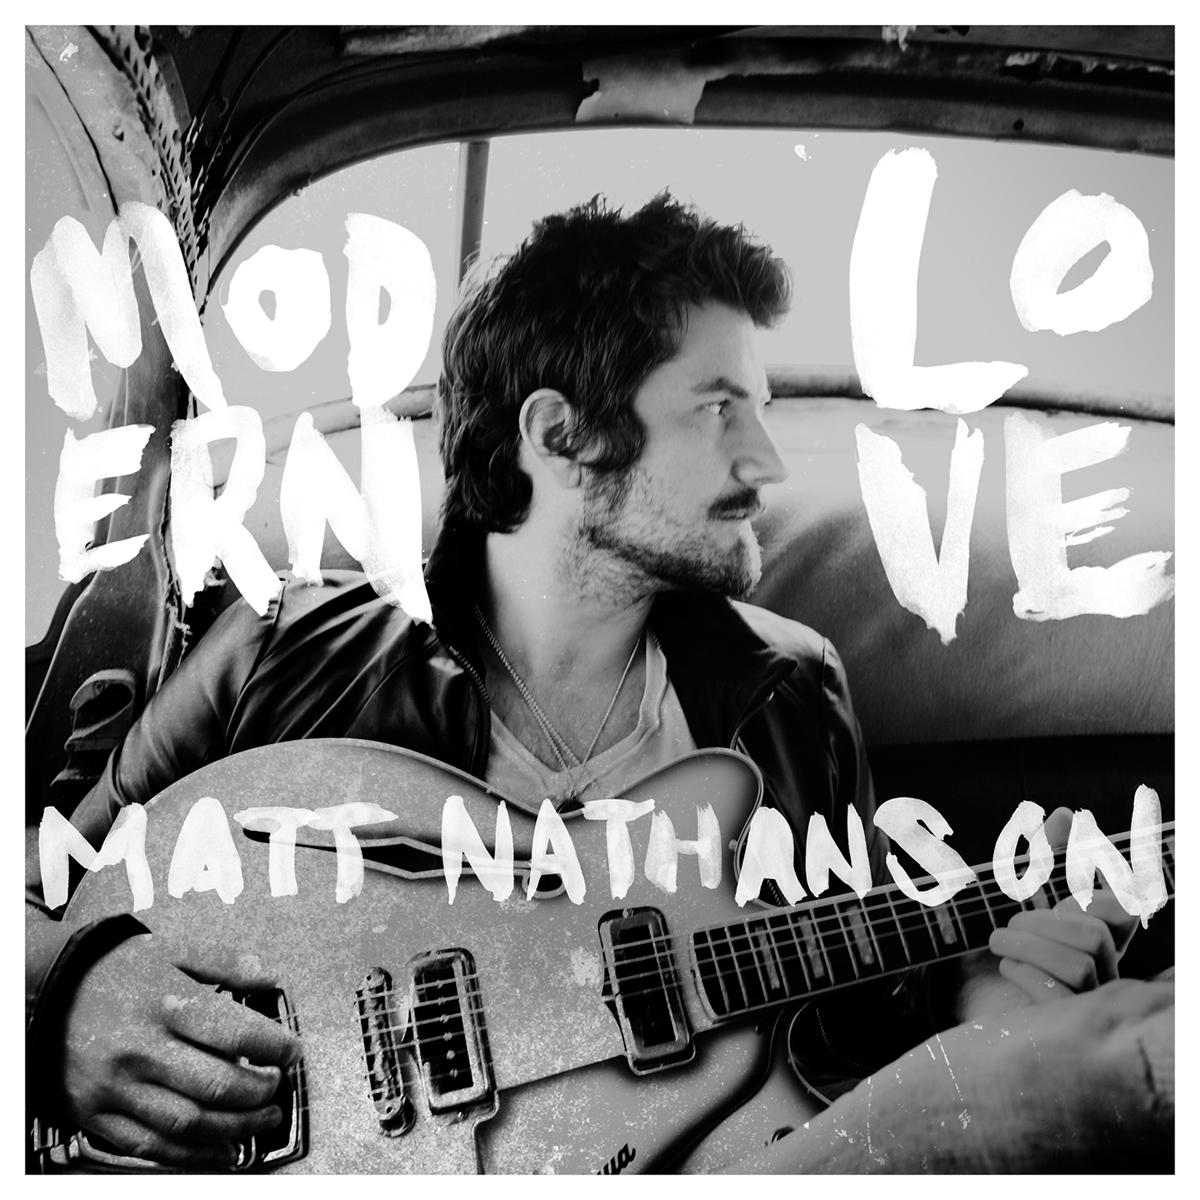 Matt Nathanson - Modern Love MP3 Download